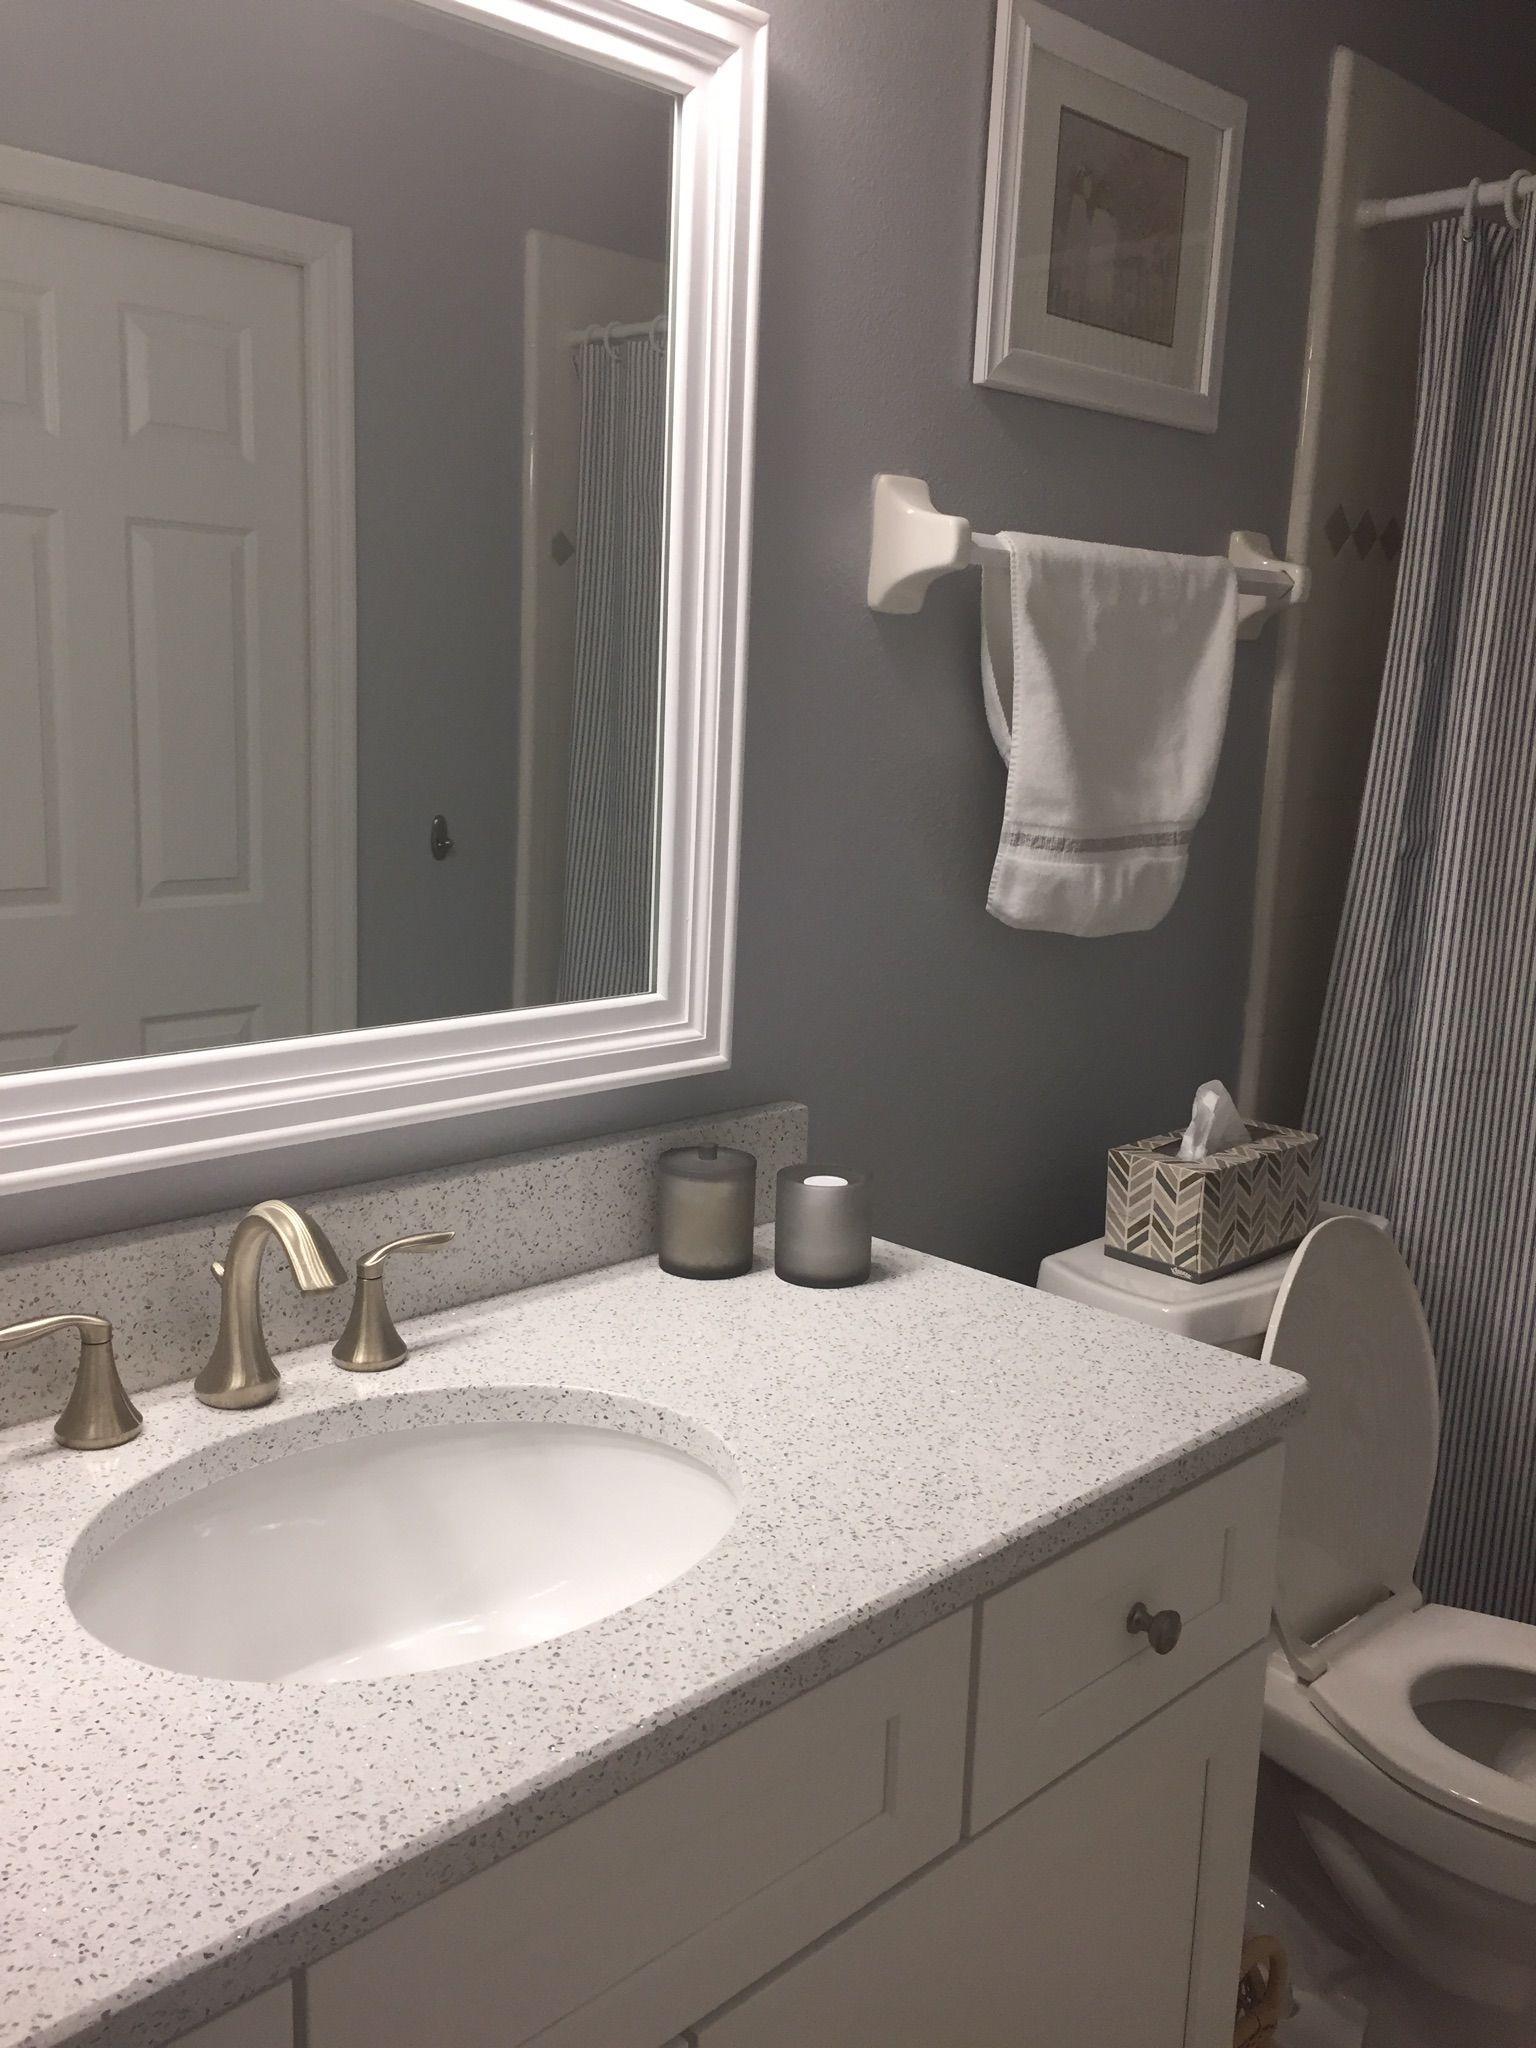 com industry ctasc report kitchen bath countertops product trends